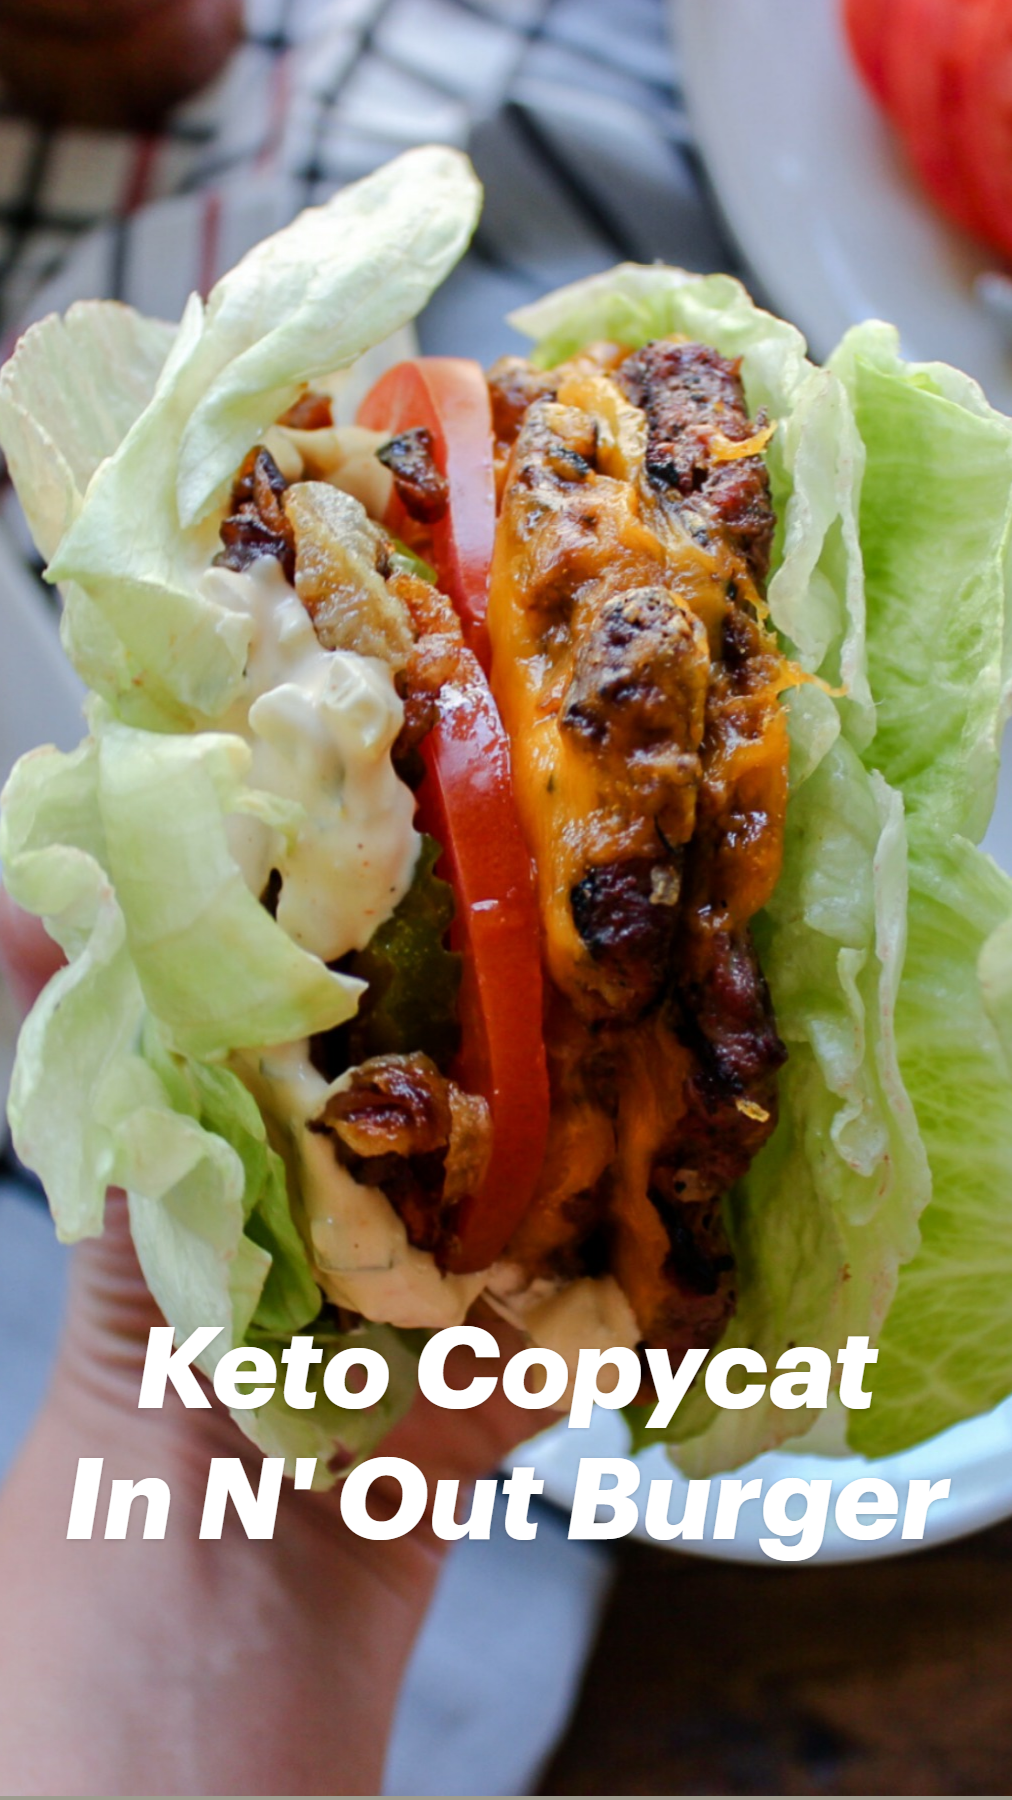 Keto Copycat In N' Out Burger